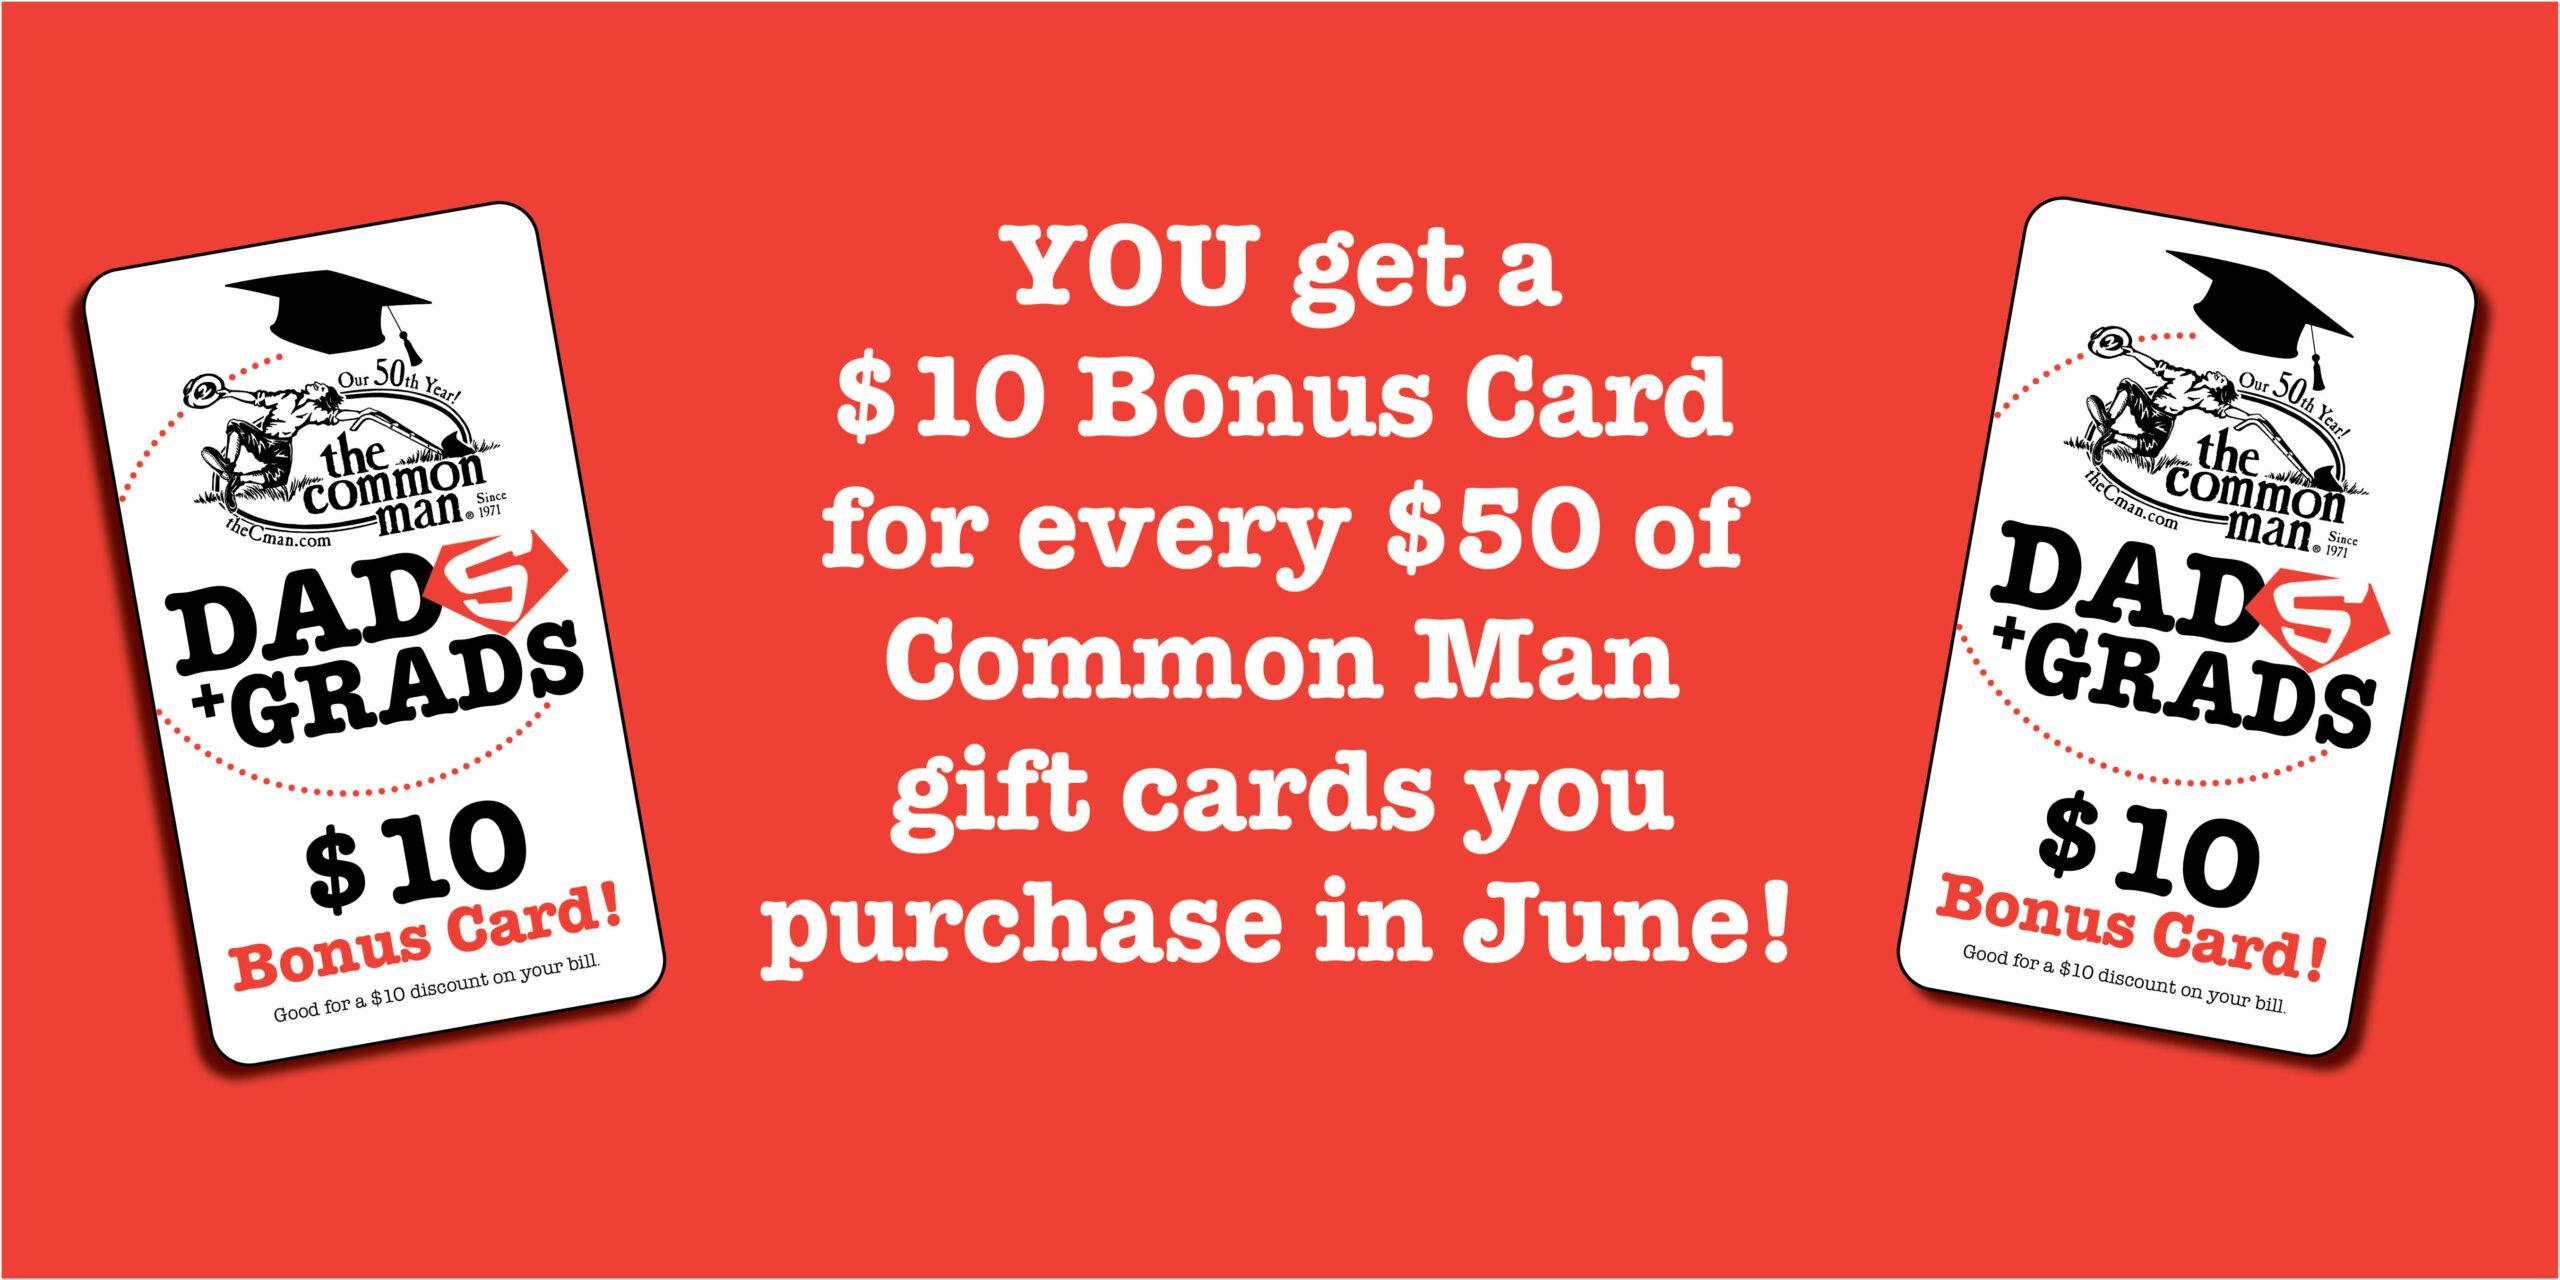 Dads and Grads bonus card offer